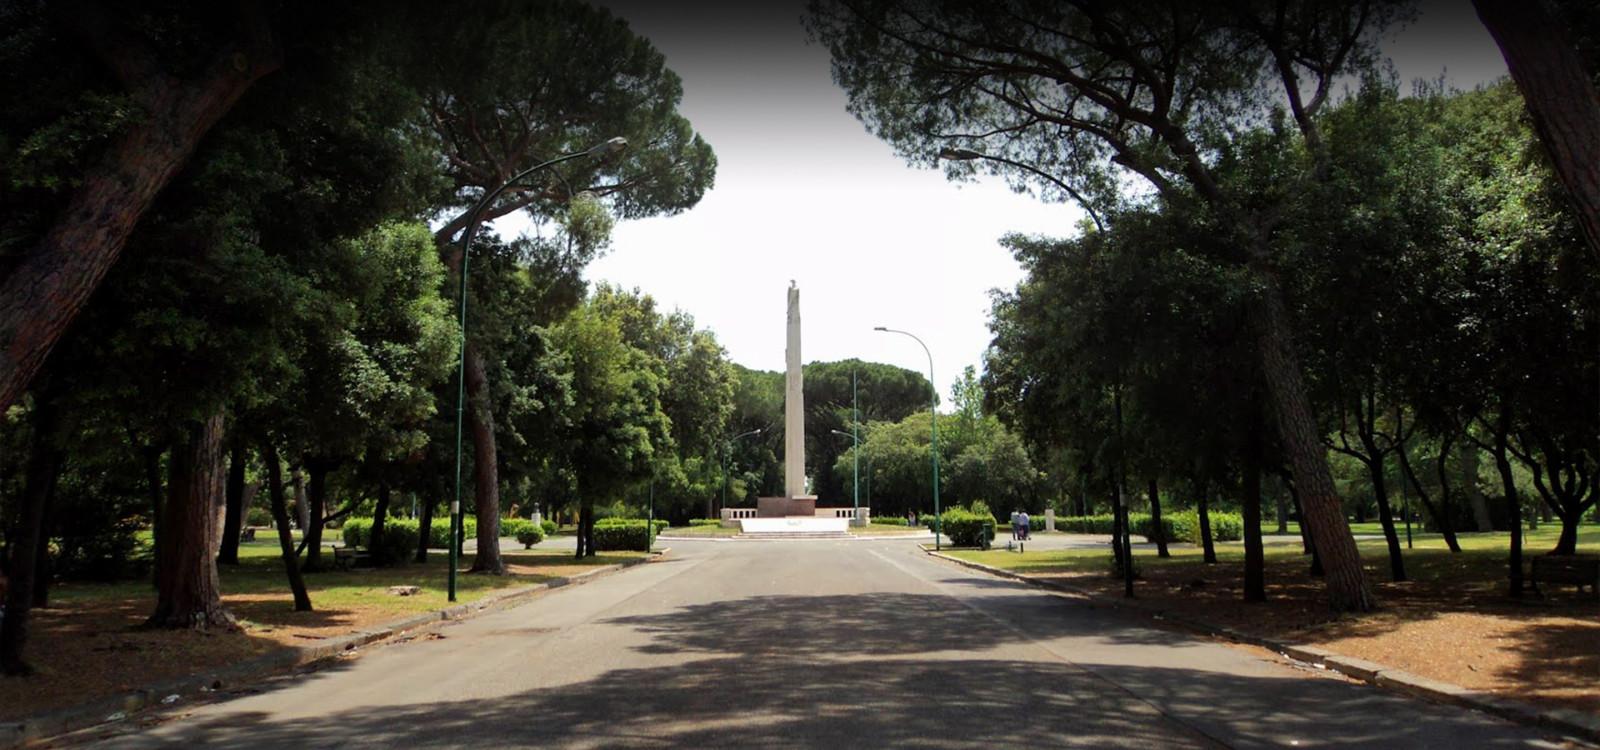 latina parco mussolini speeches - photo#1